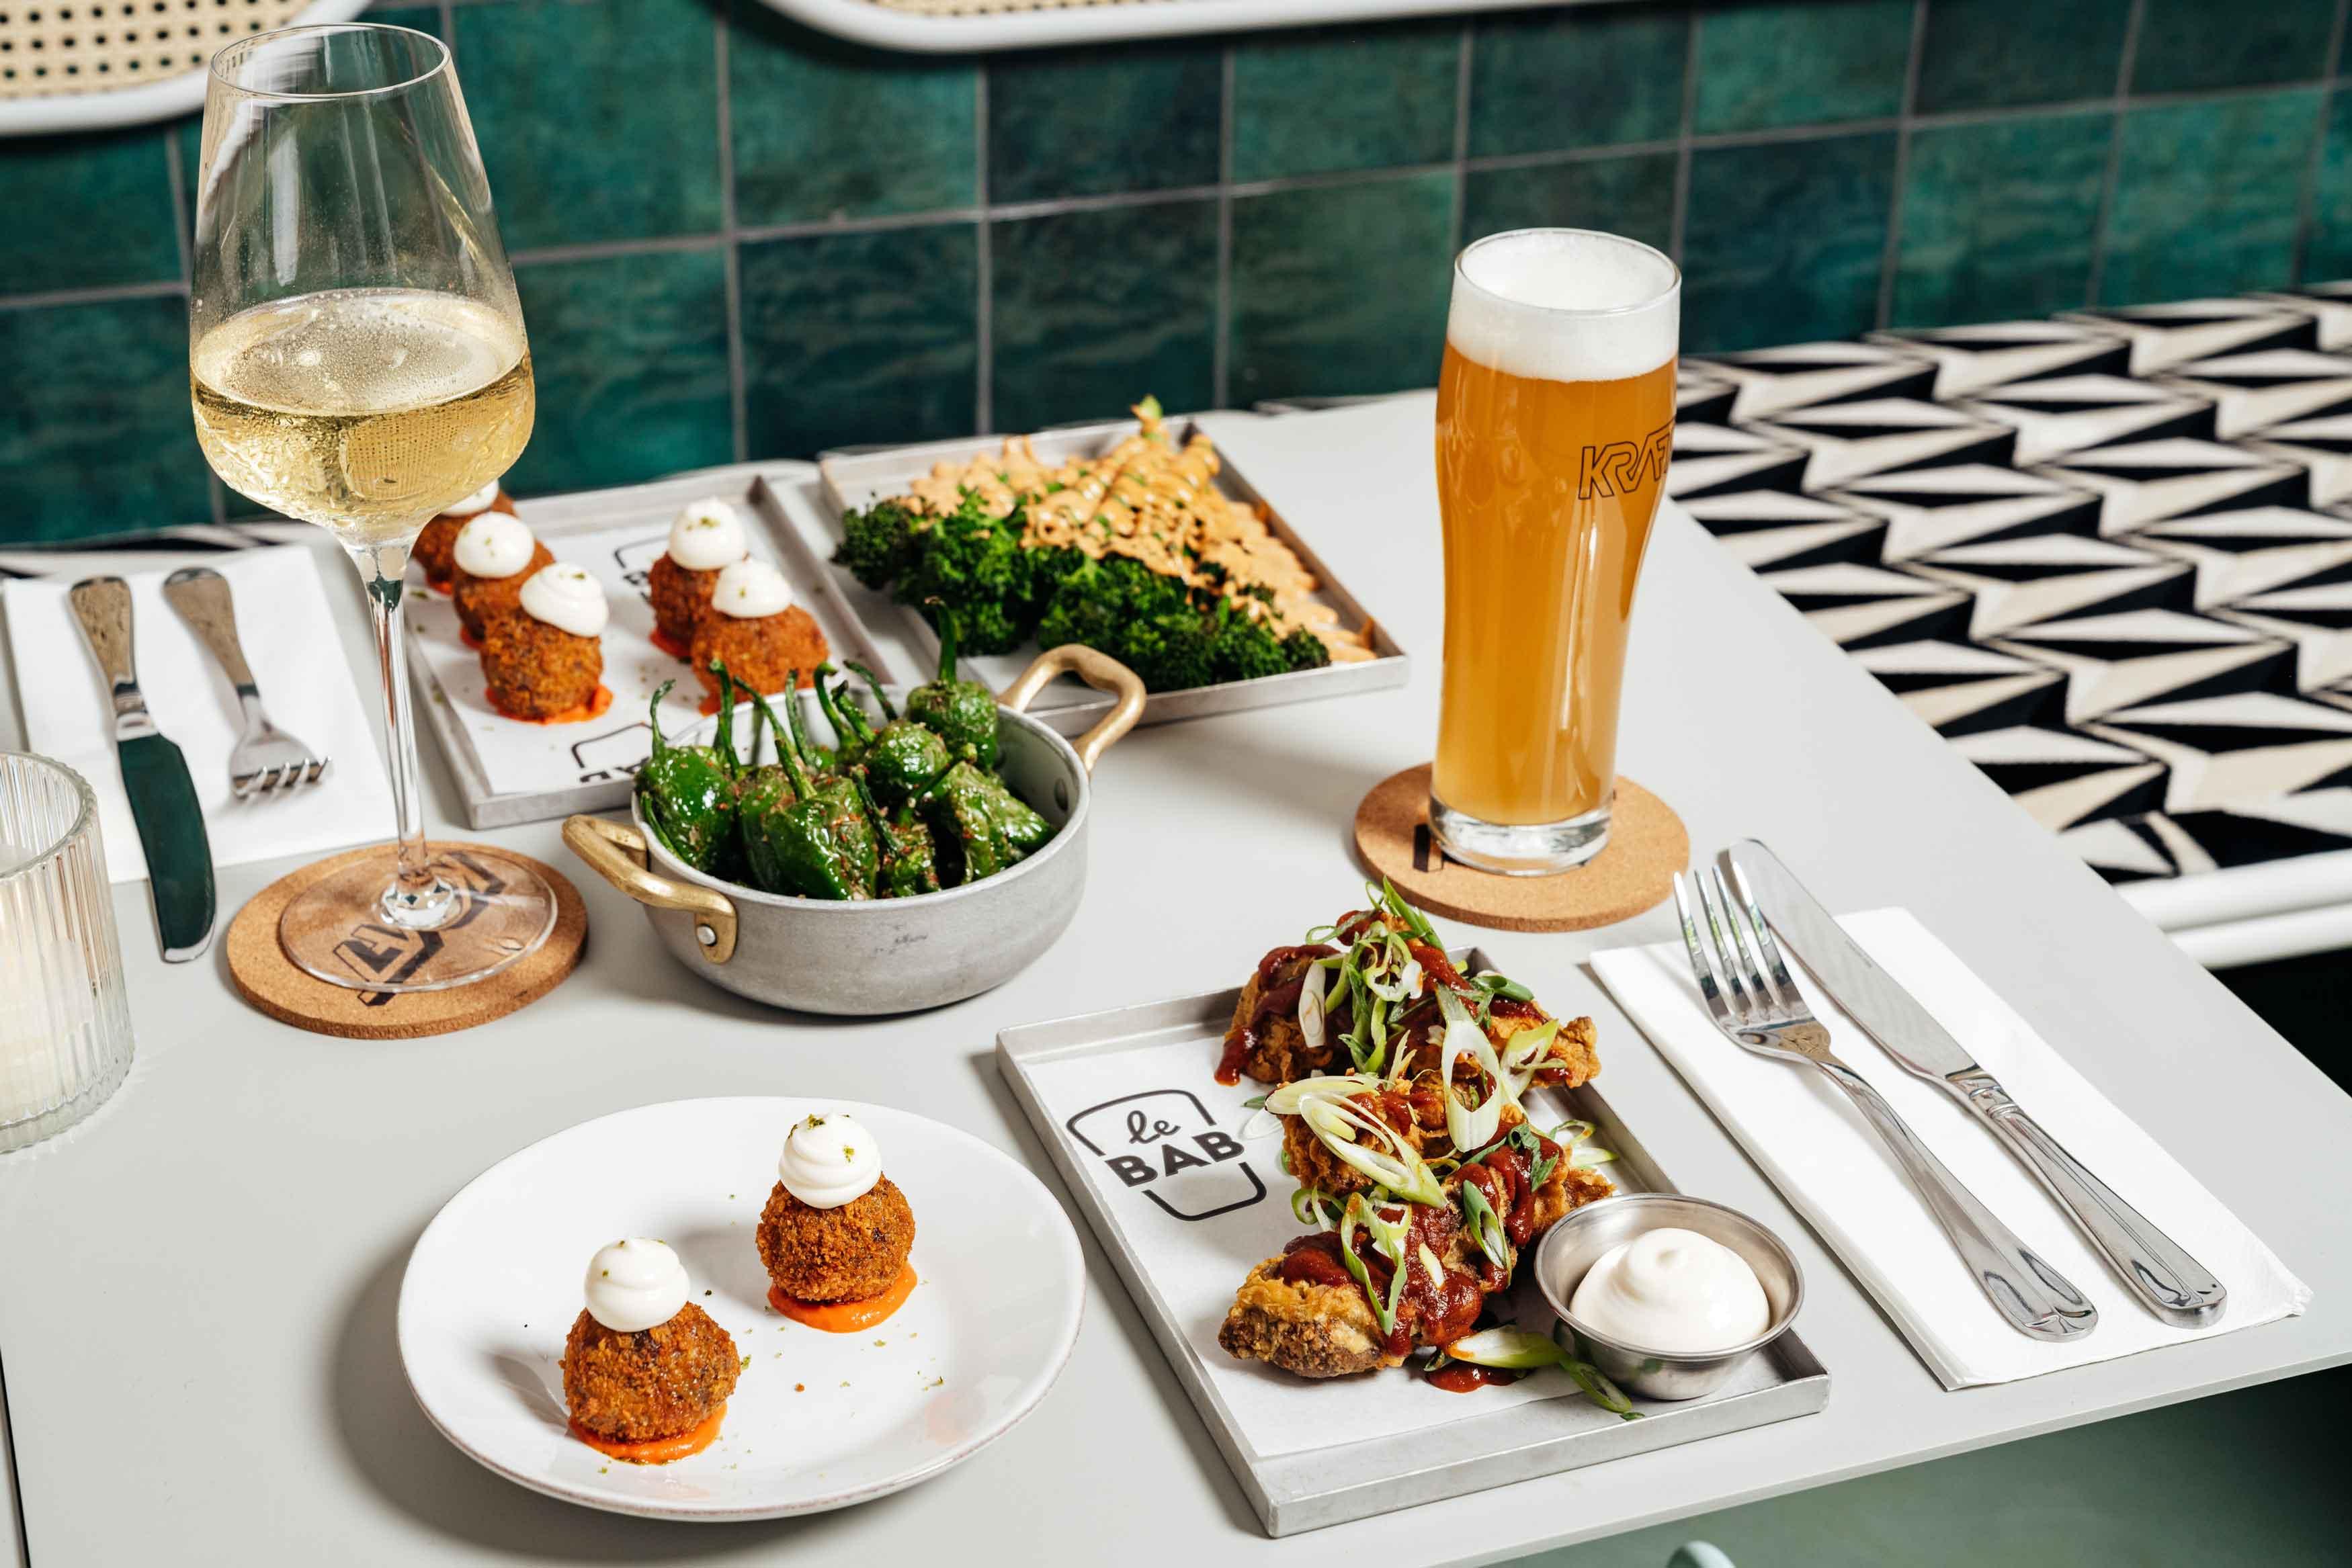 Kraft Dalston - Food & Drink - Korean Fried Chicken - Le Bab - German Kraft Brewery - Jim And Tonic Distillery - Kingsland High Street